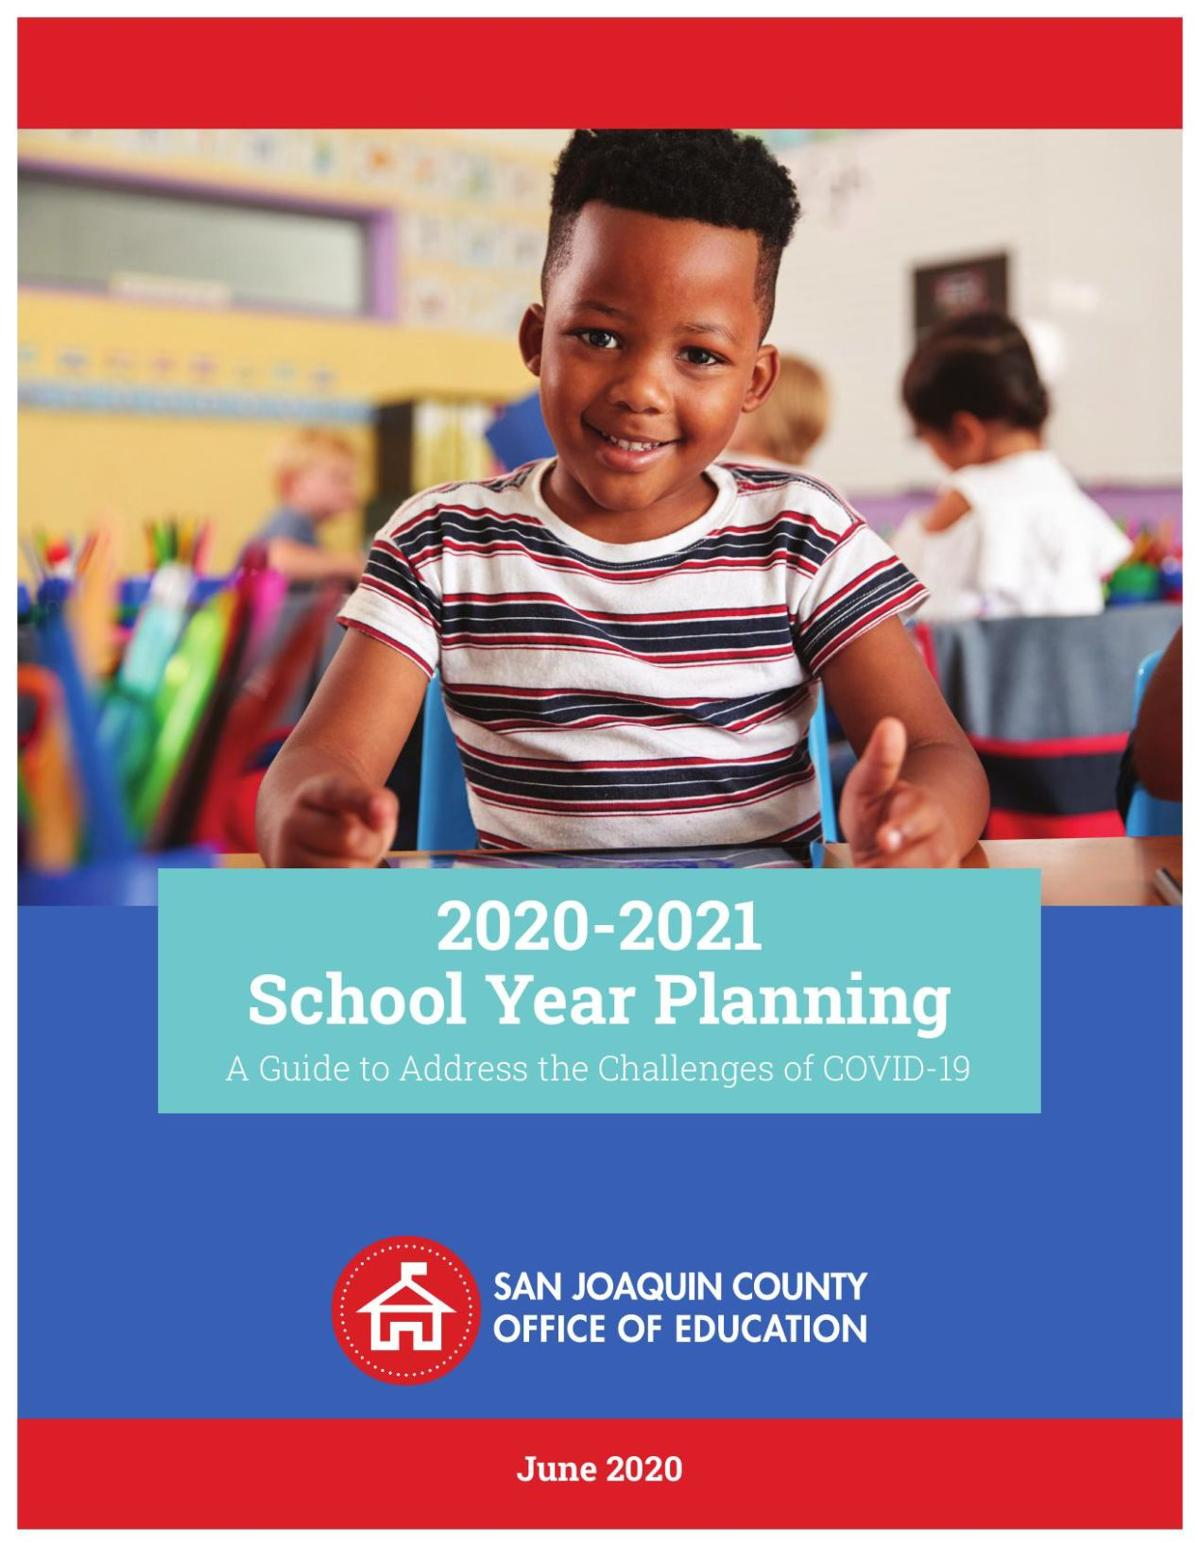 San Joaquin County School Reopening Guidance